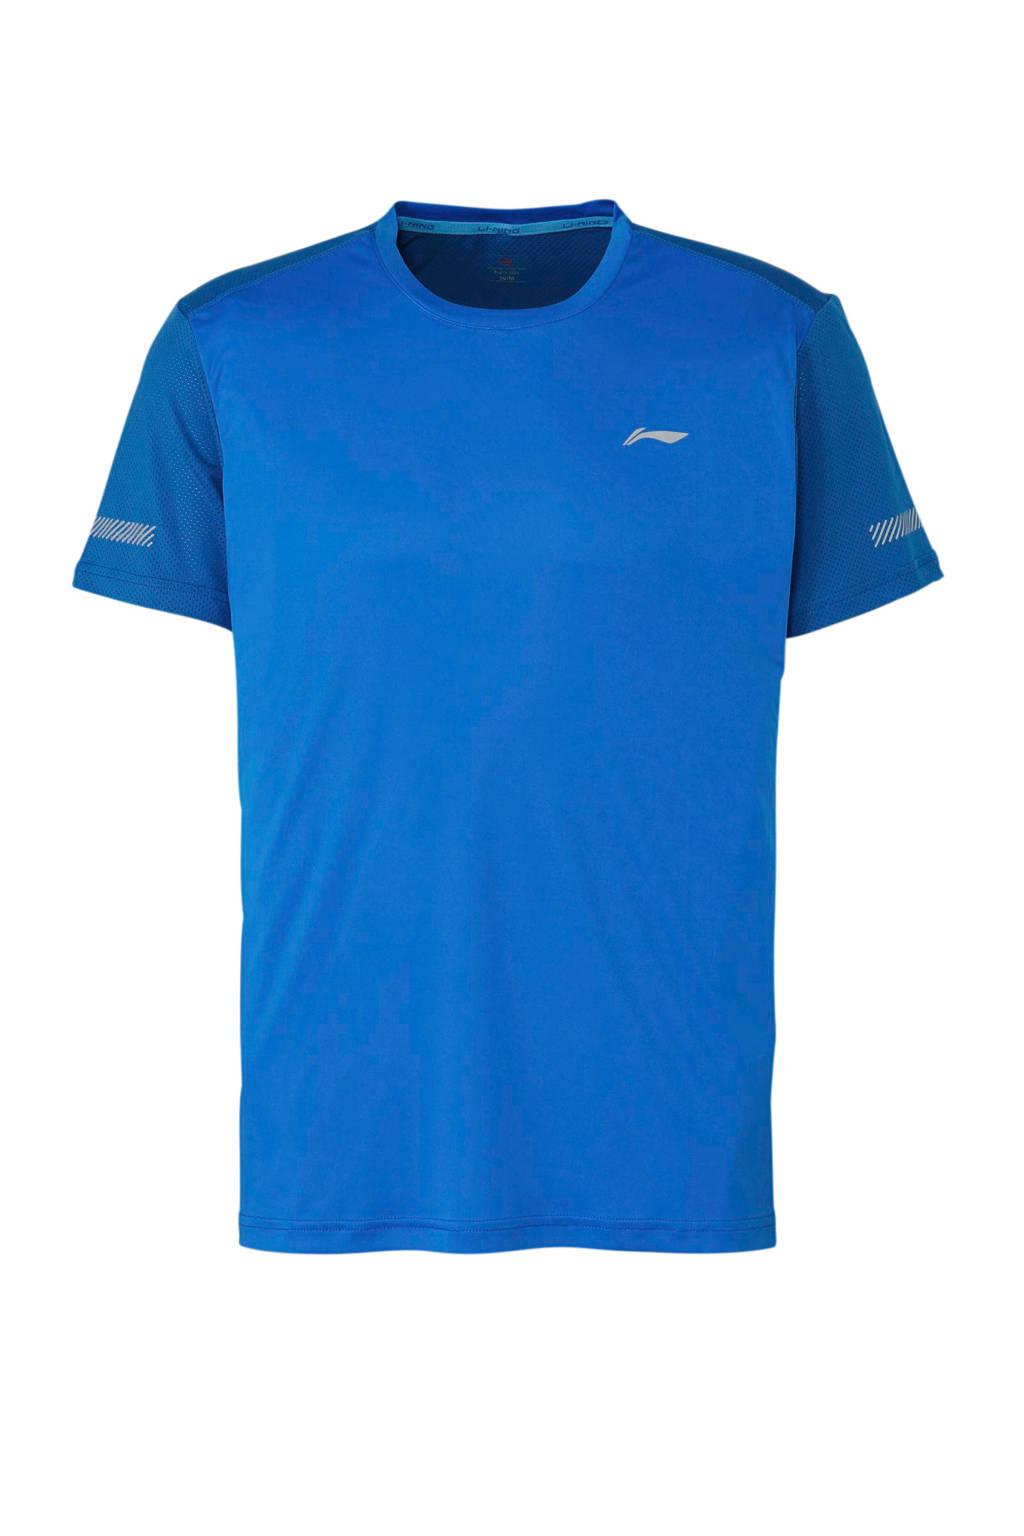 Li-Ning   hardloopshirt blauw, Blauw